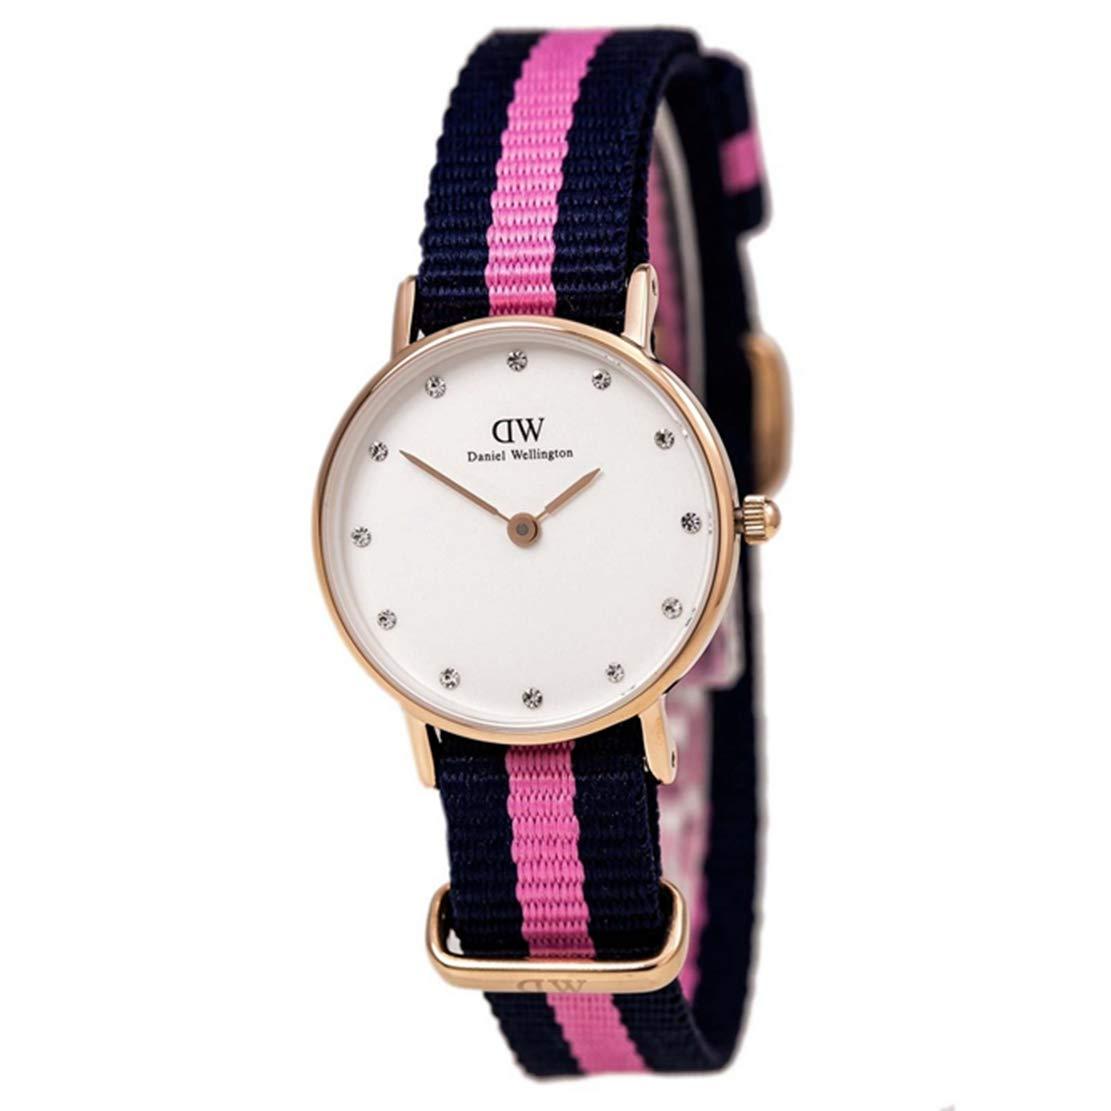 Daniel Wellington 丹尼尔·惠灵顿=尼龙表带 手表 不同批次包装盒随机发送(瑞典品牌 保税区发货)(包邮包税) 原价669元